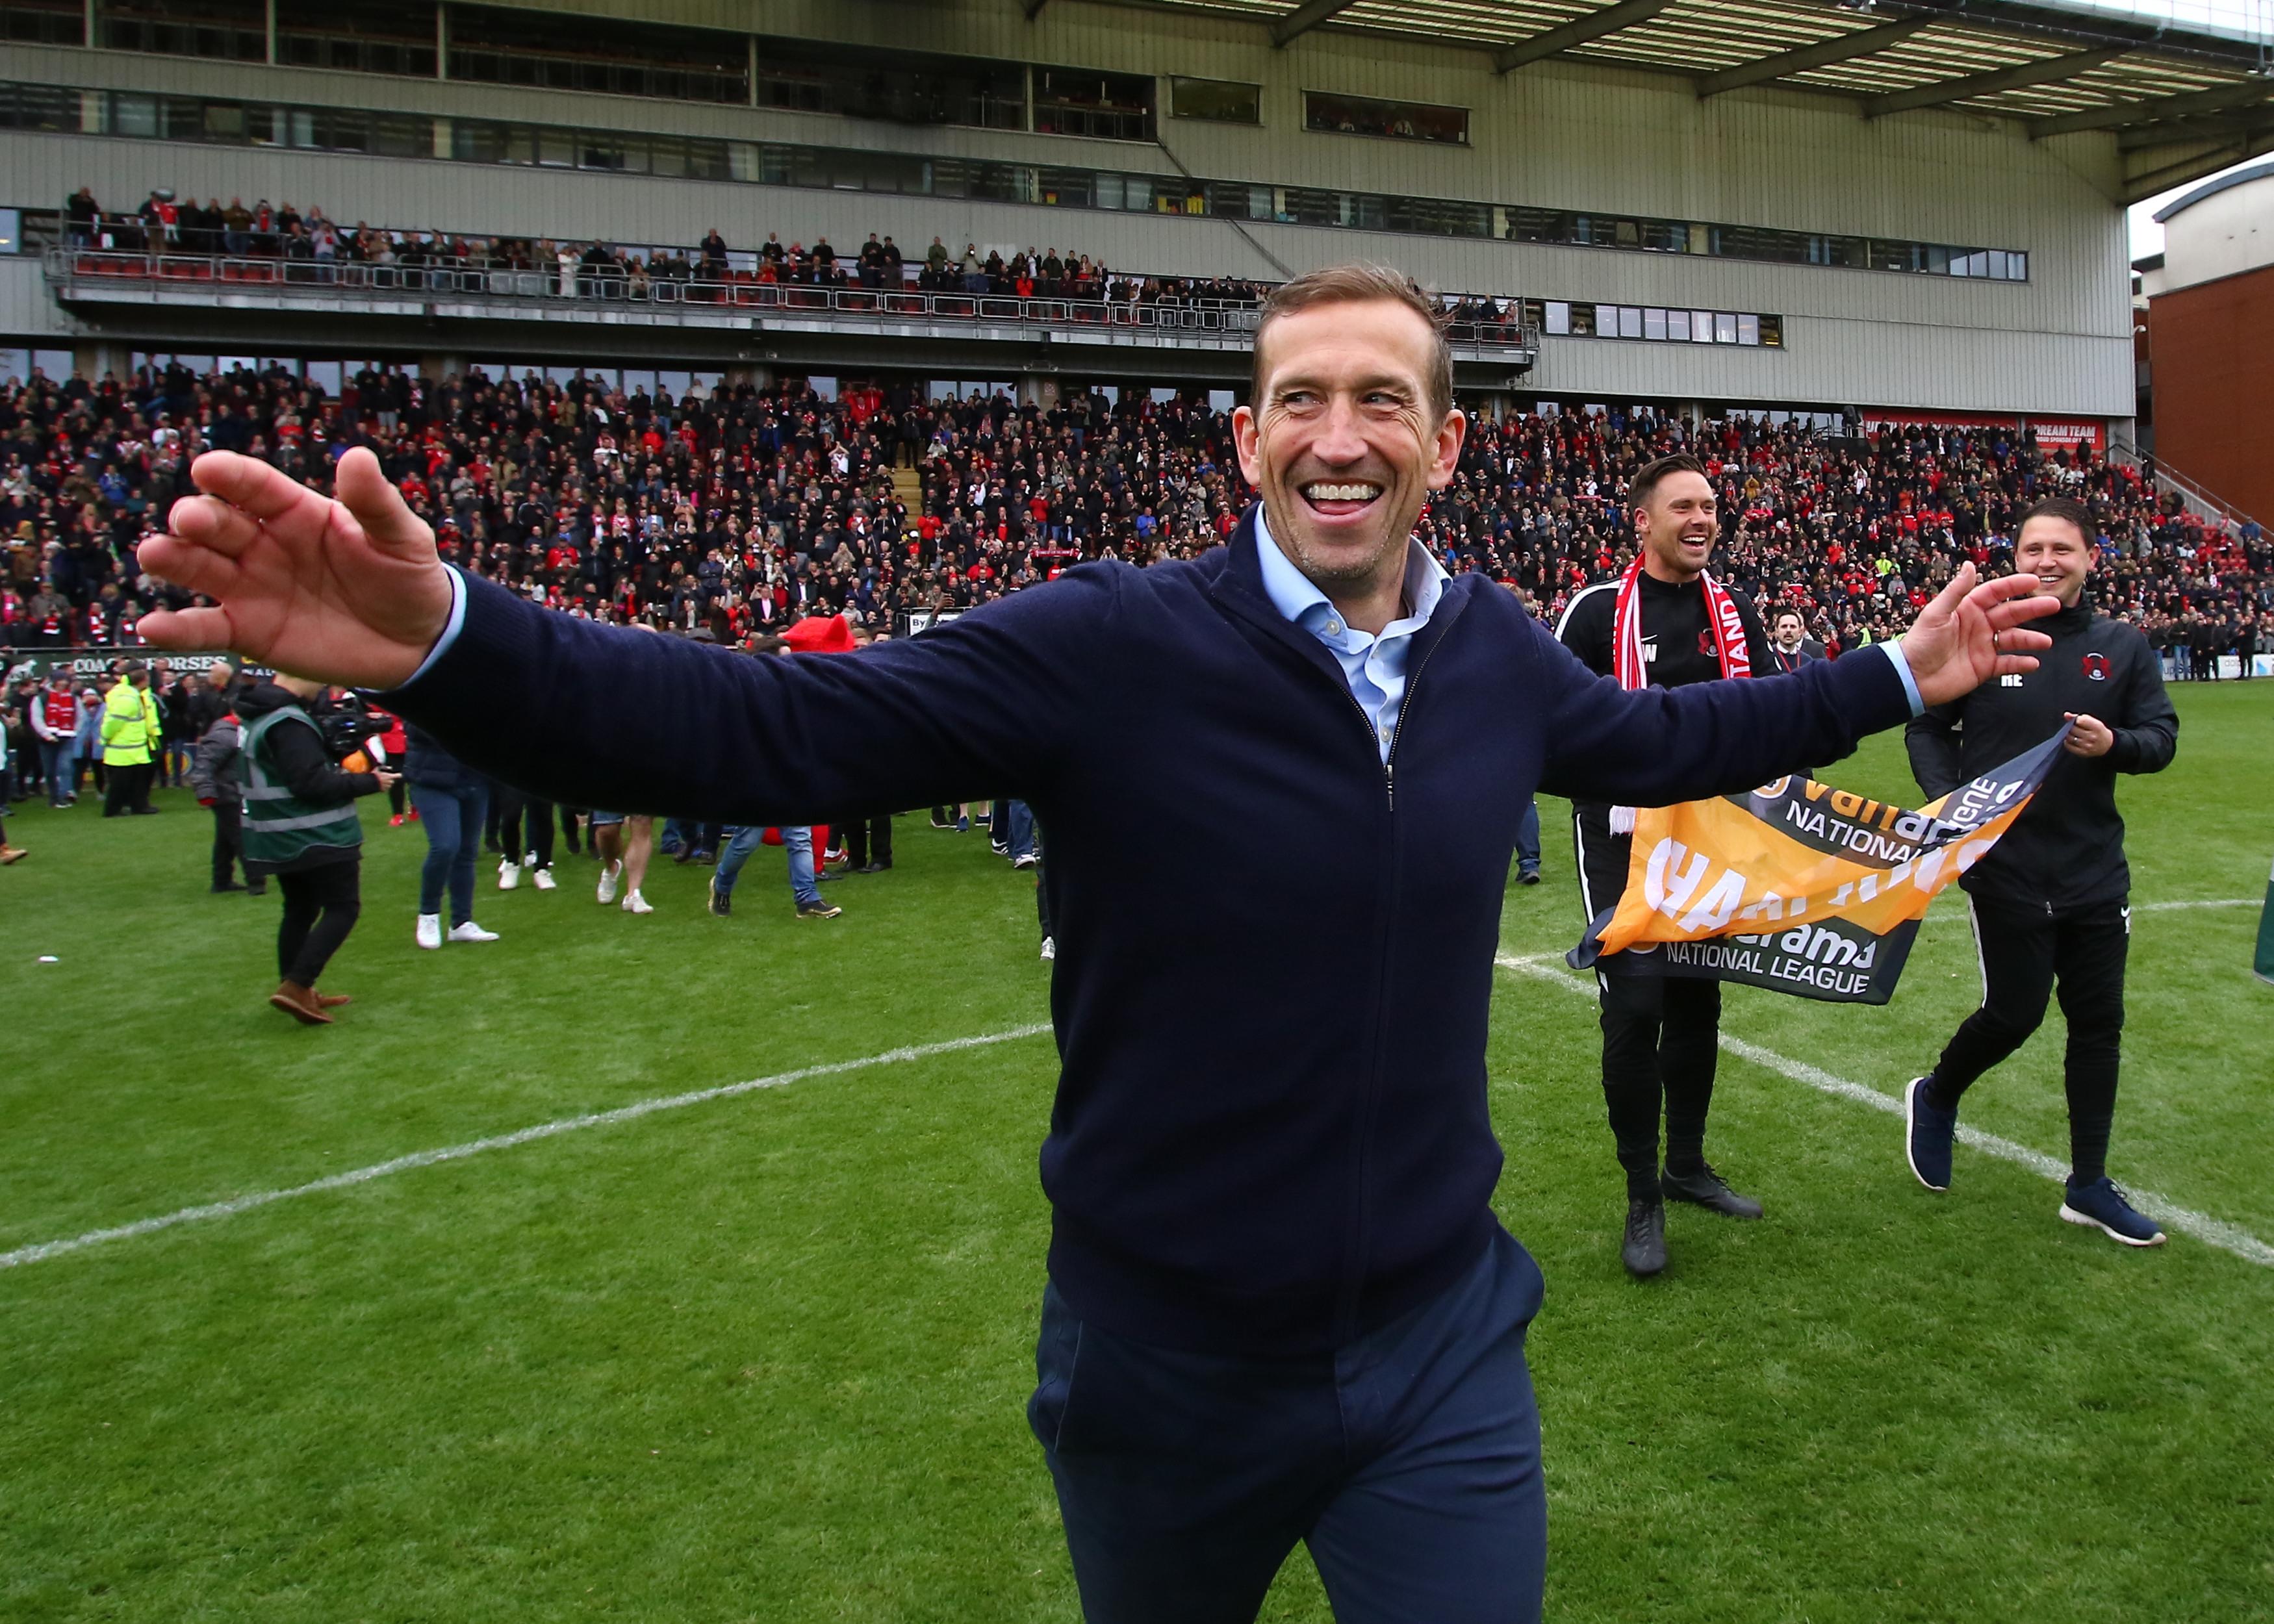 Just weeks ago Edinburgh was celebrating winning the National League. Image: PA Images